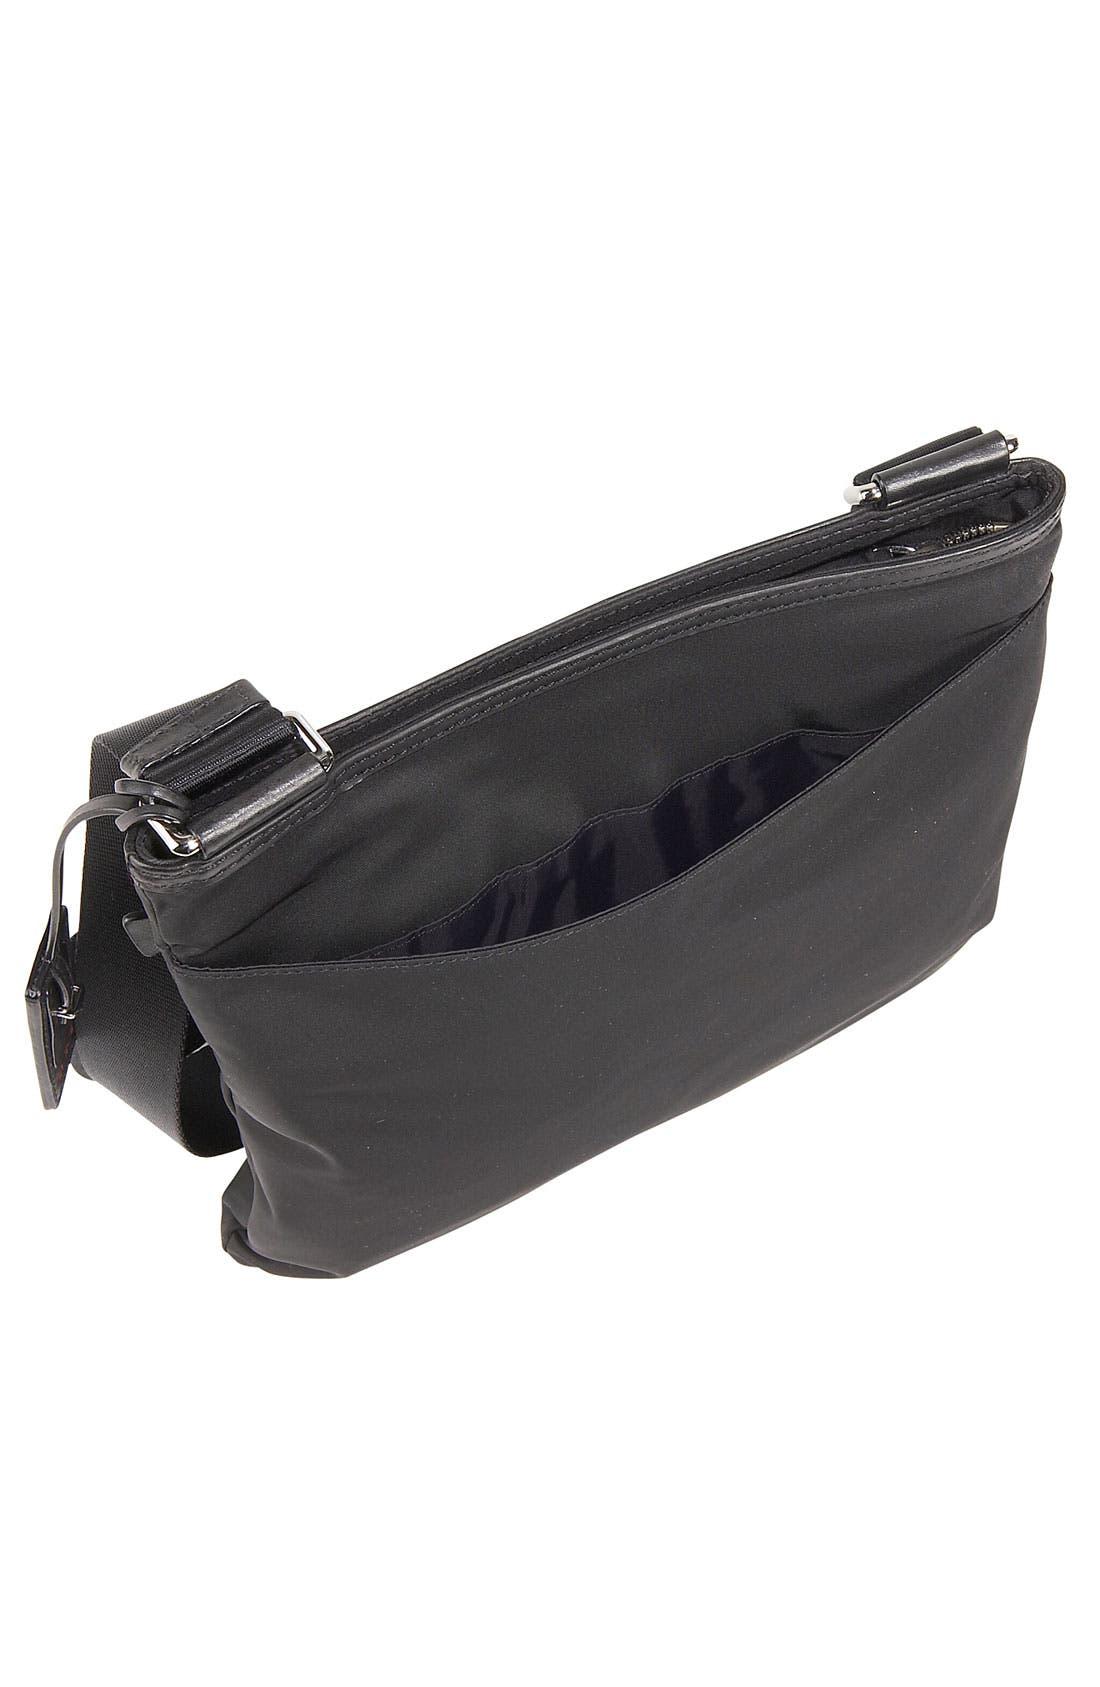 'Voyager - Capri' Crossbody Bag,                             Alternate thumbnail 3, color,                             001